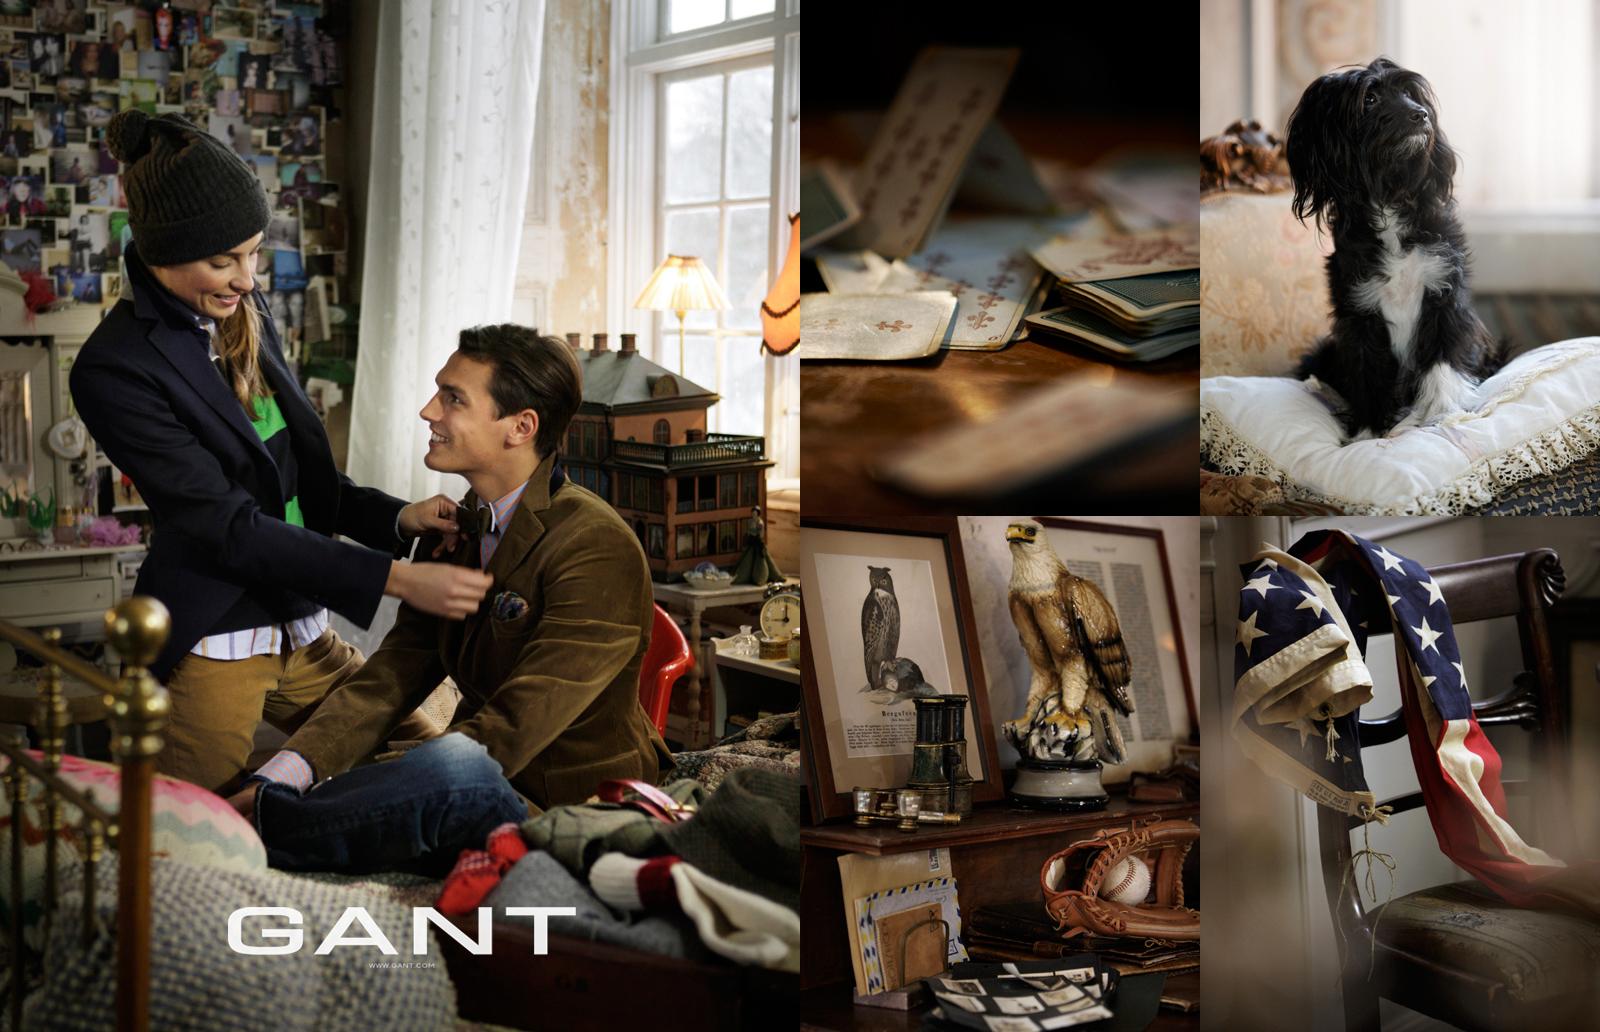 tweedland the gentlemen 39 s club gant. Black Bedroom Furniture Sets. Home Design Ideas